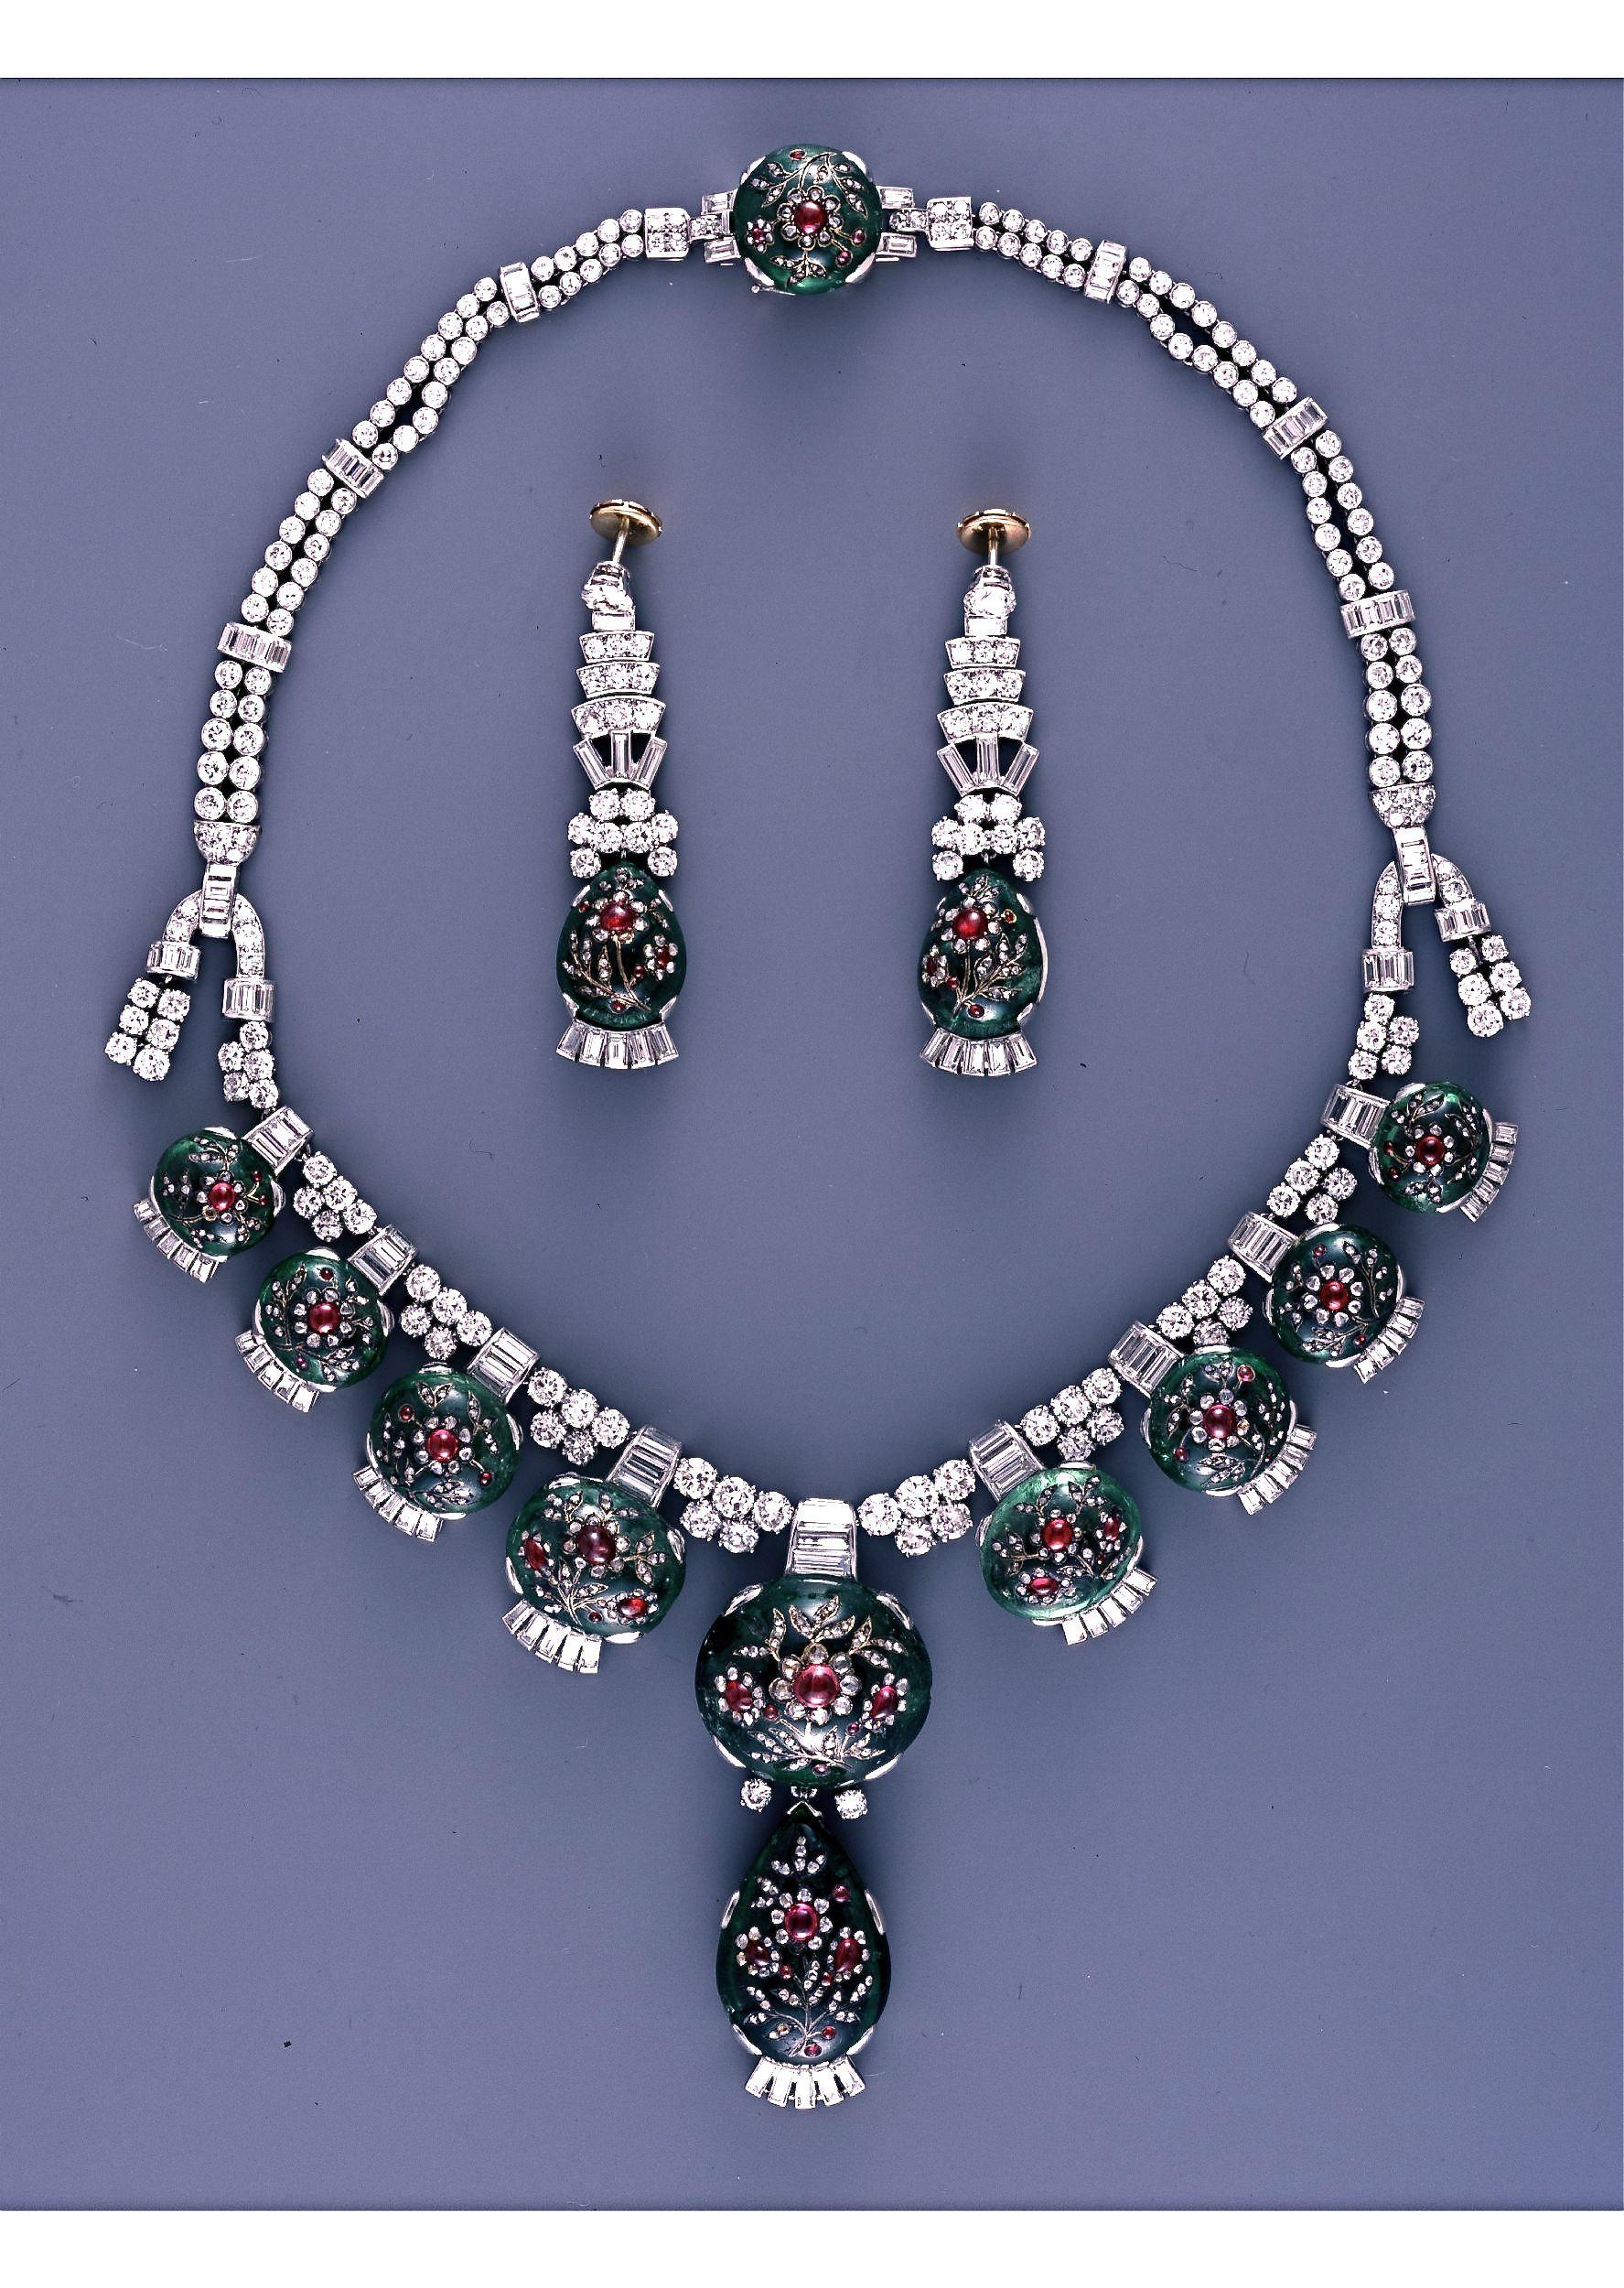 Cartier London Art Deco Diamond Emerald Necklace And Earrings 1937